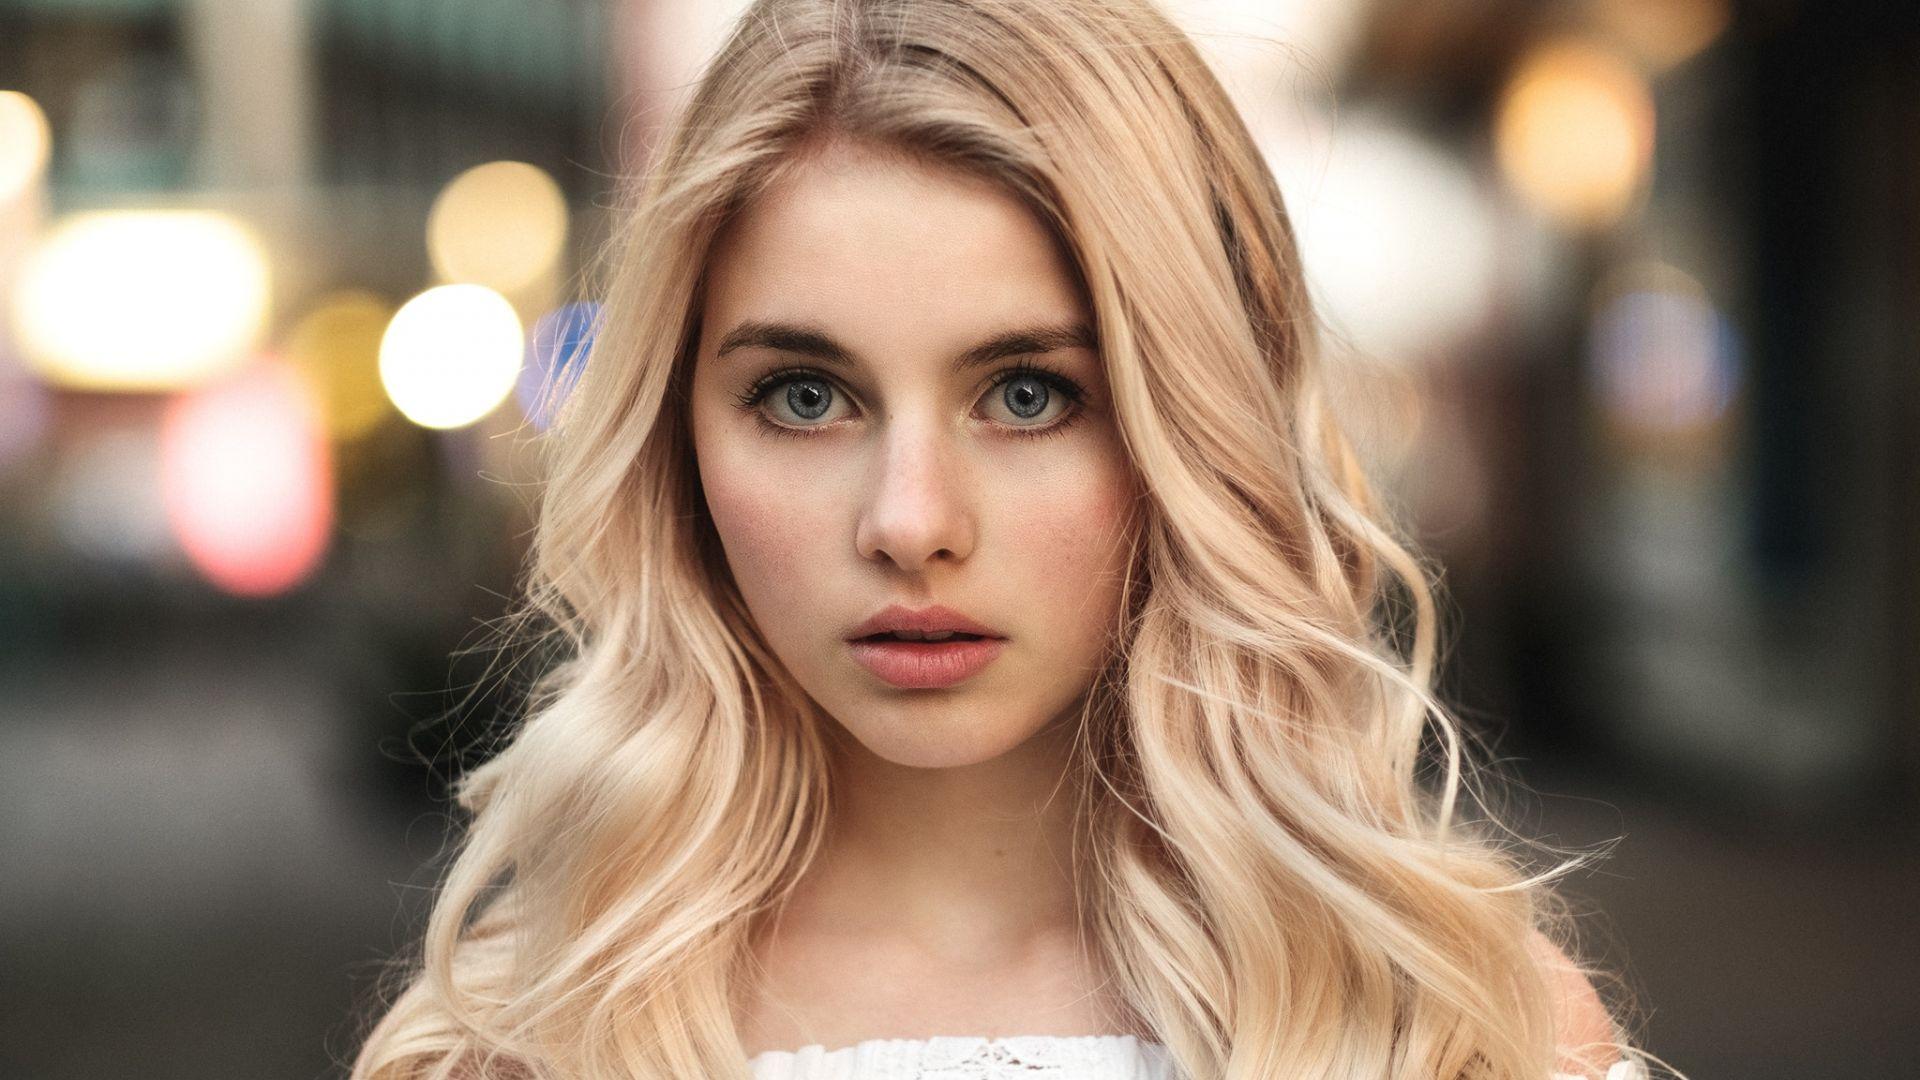 Wallpaper Cute Face, blonde, model